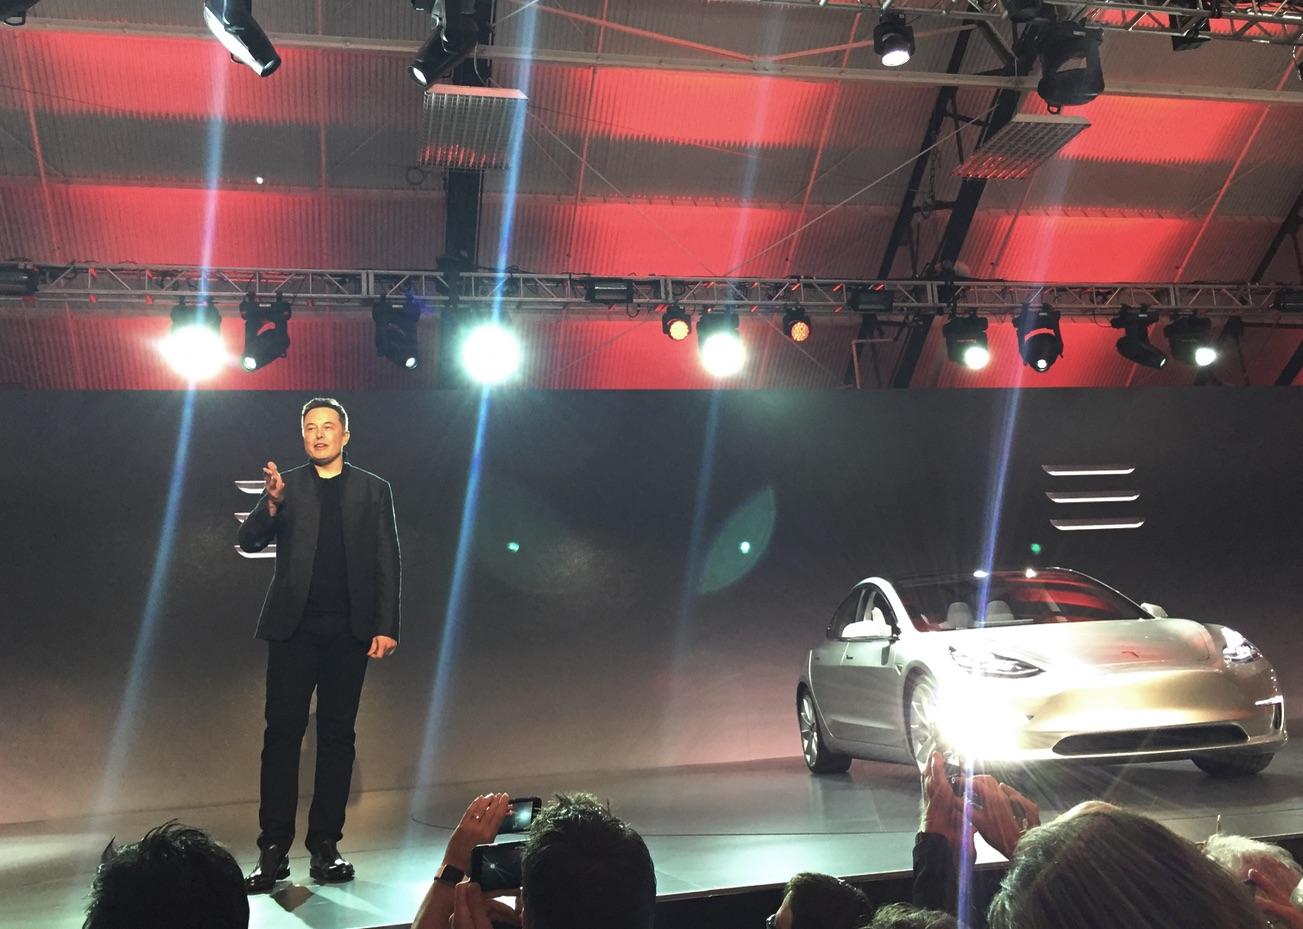 Elon Musk presents the Model 3 at Hawthorne, CA